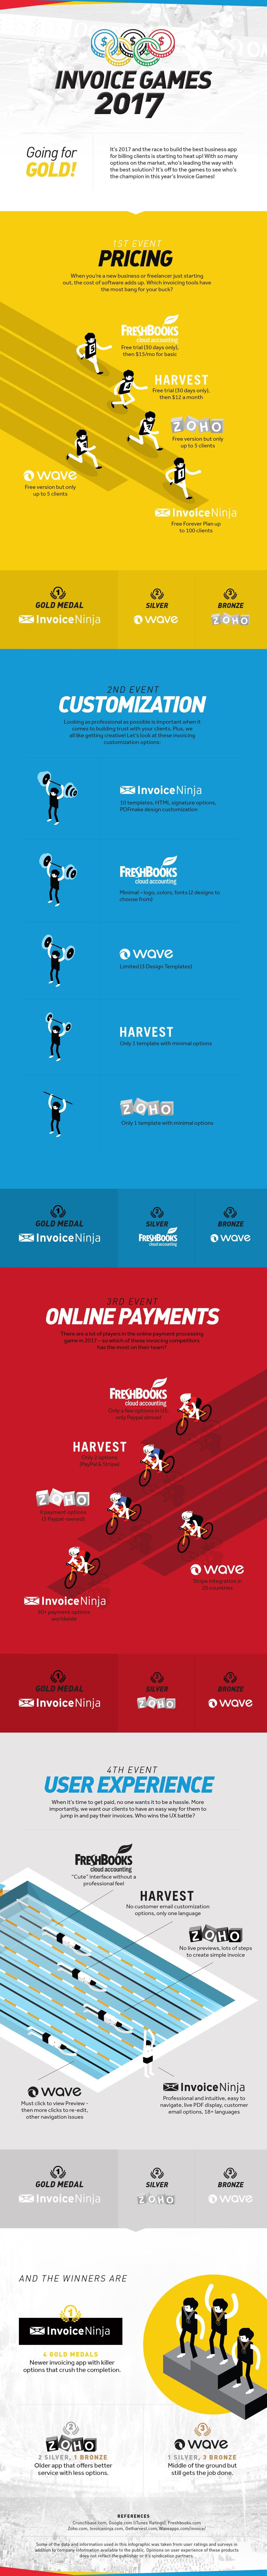 Invoice Games 2017